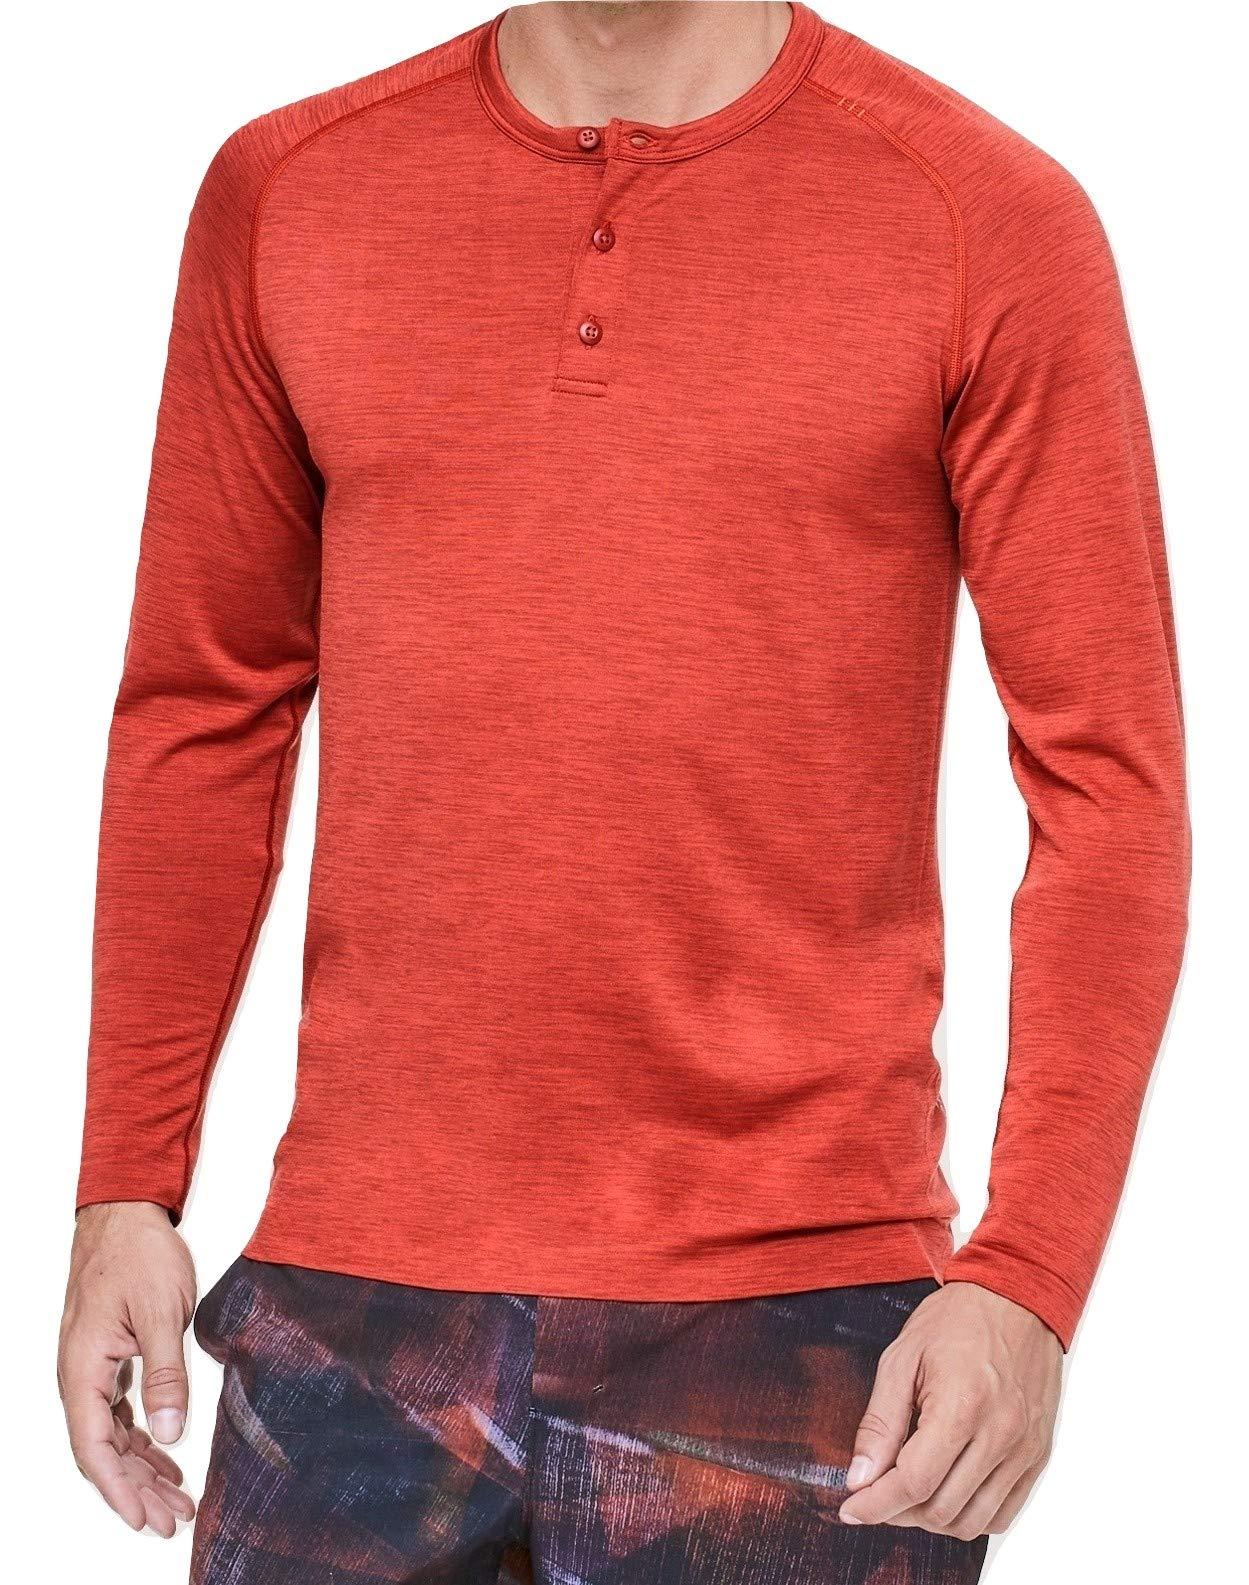 Lululemon Mens Metal Vent Tech Henley Long Sleeve Shirt (Magma Flames, S)